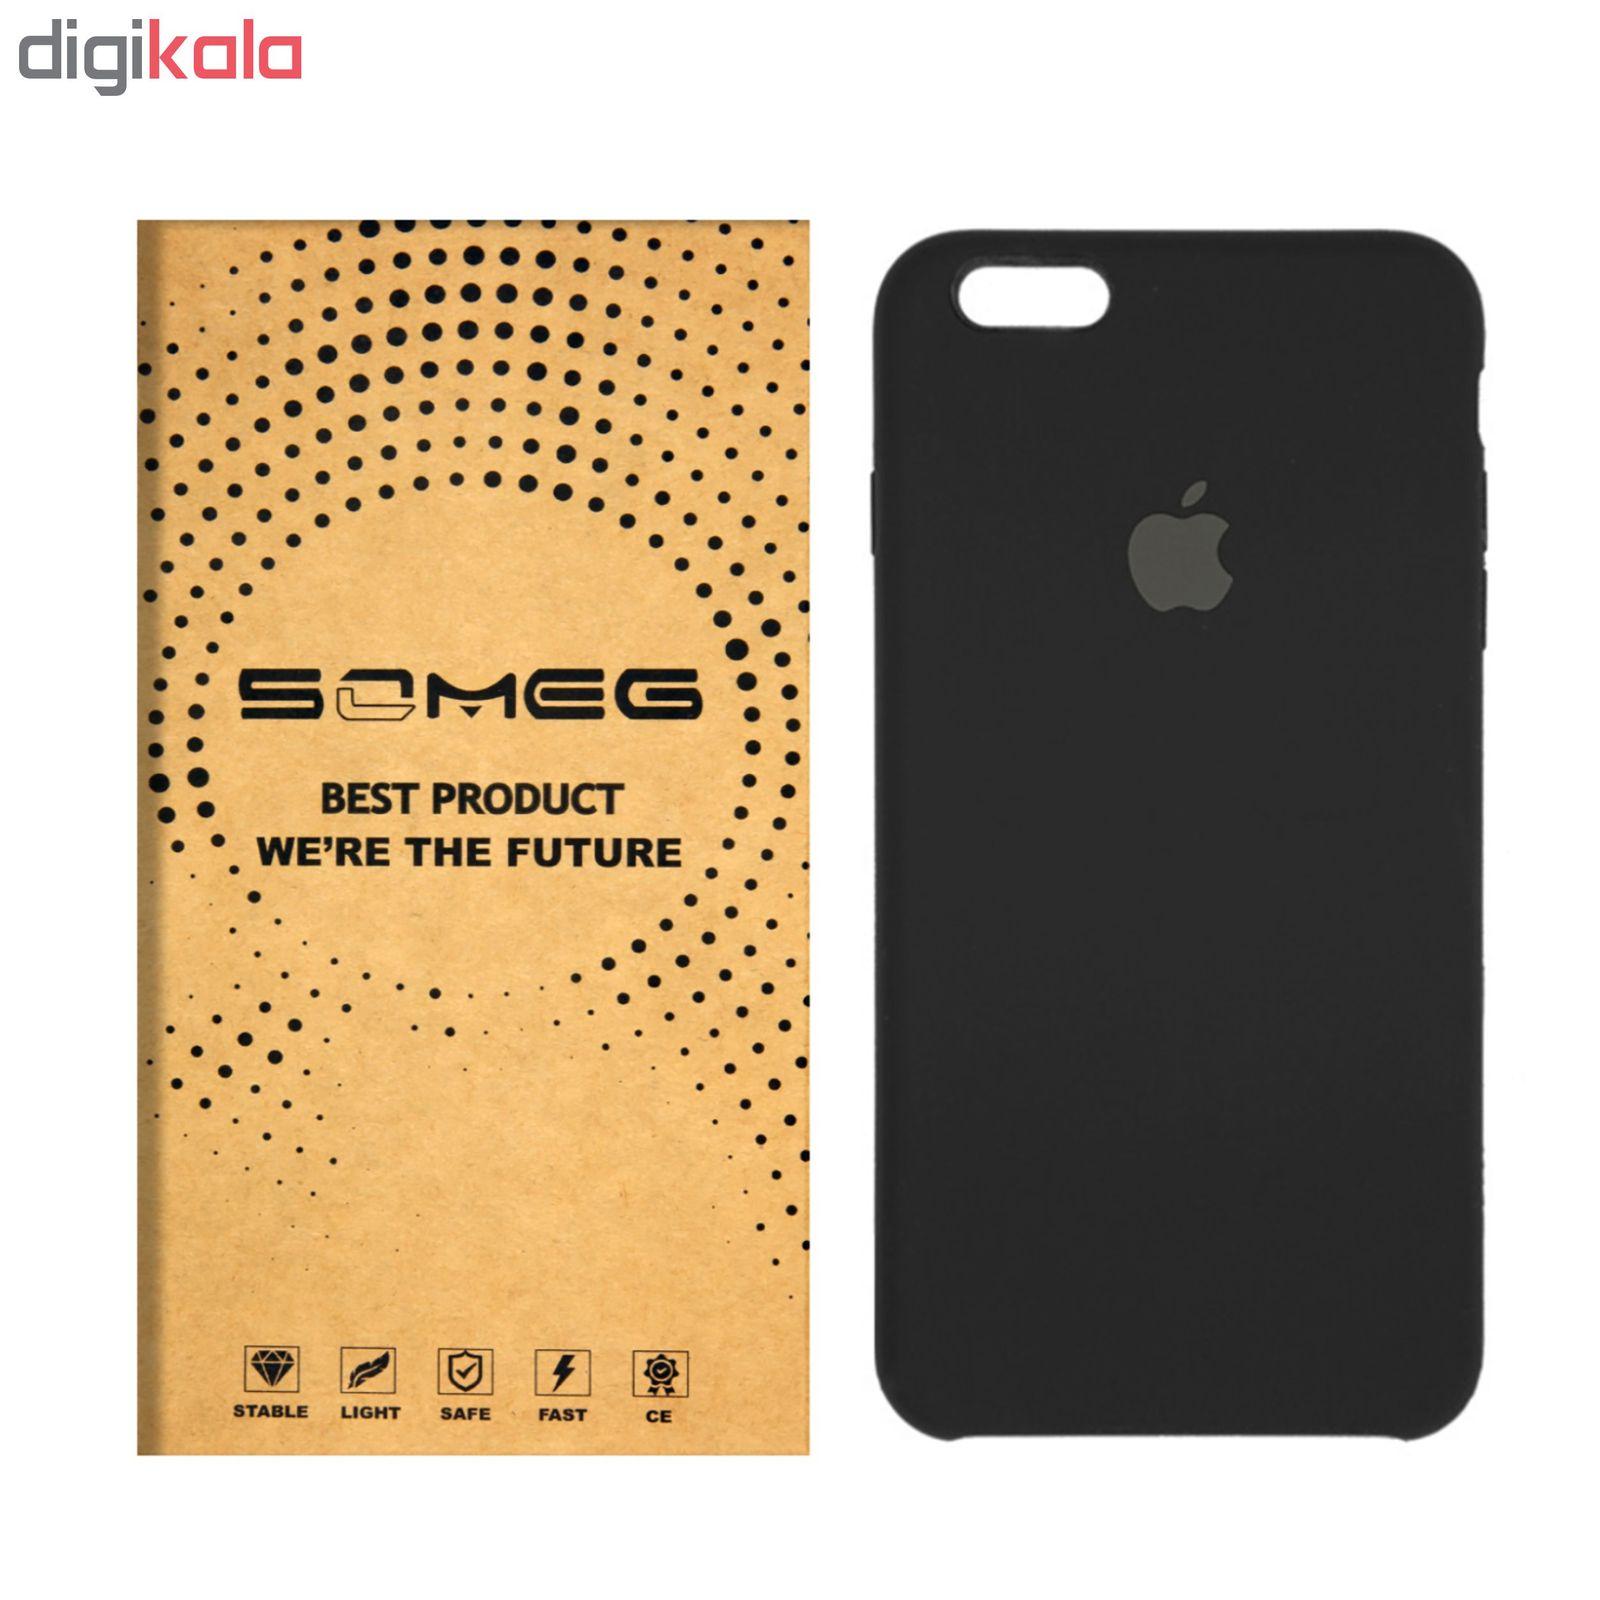 کاور سومگ مدل SIC مناسب برای گوشی موبایل اپل iPhone 6/6s main 1 1